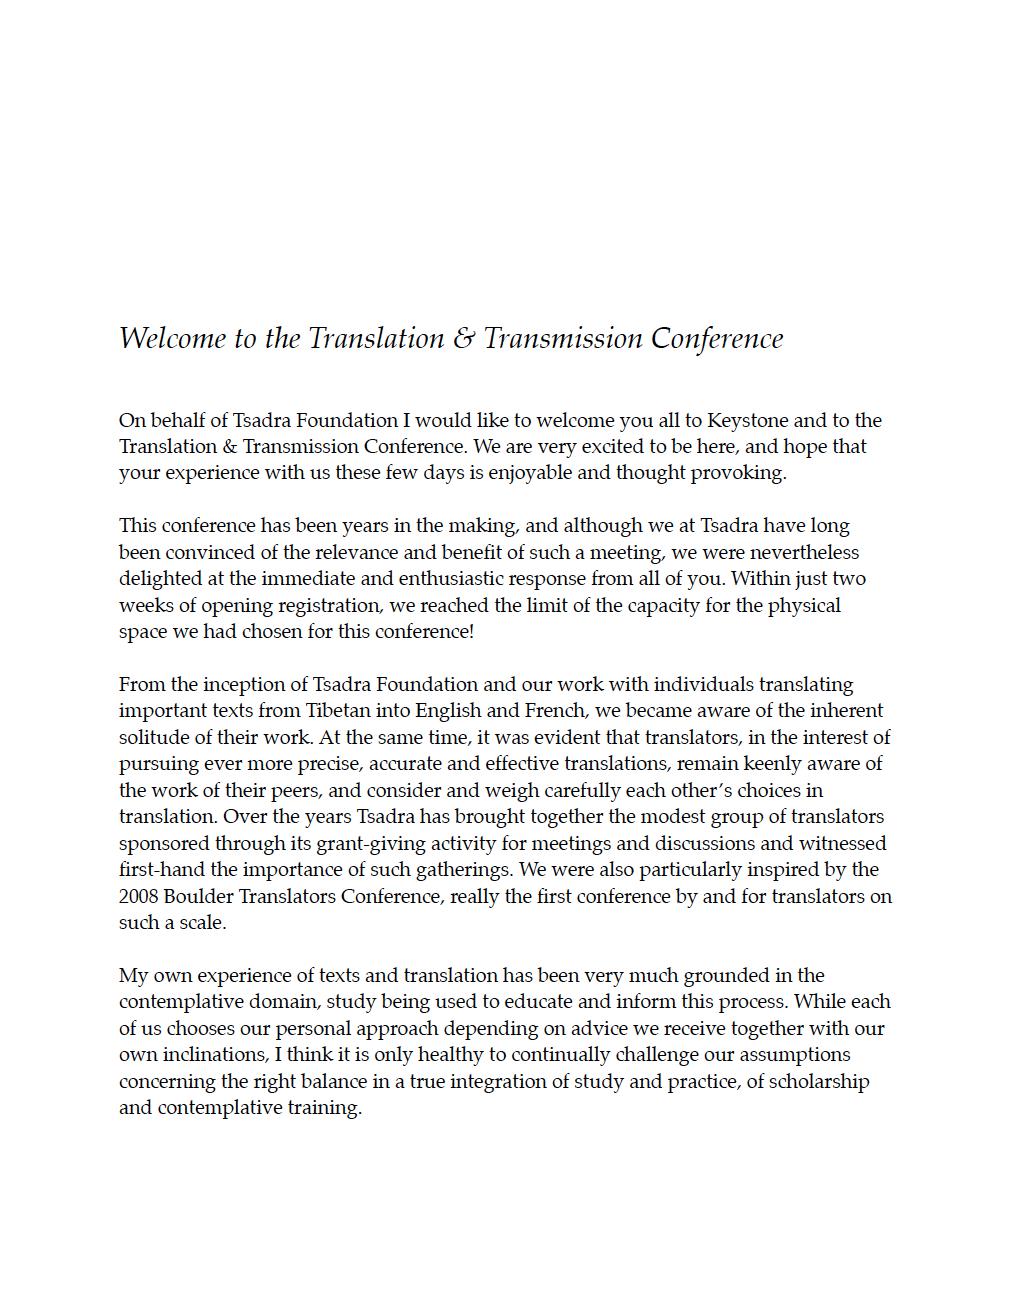 014 Openingremarksanthonychapman Essay Example Impressive Description Descriptive Topics College About A Pet Full